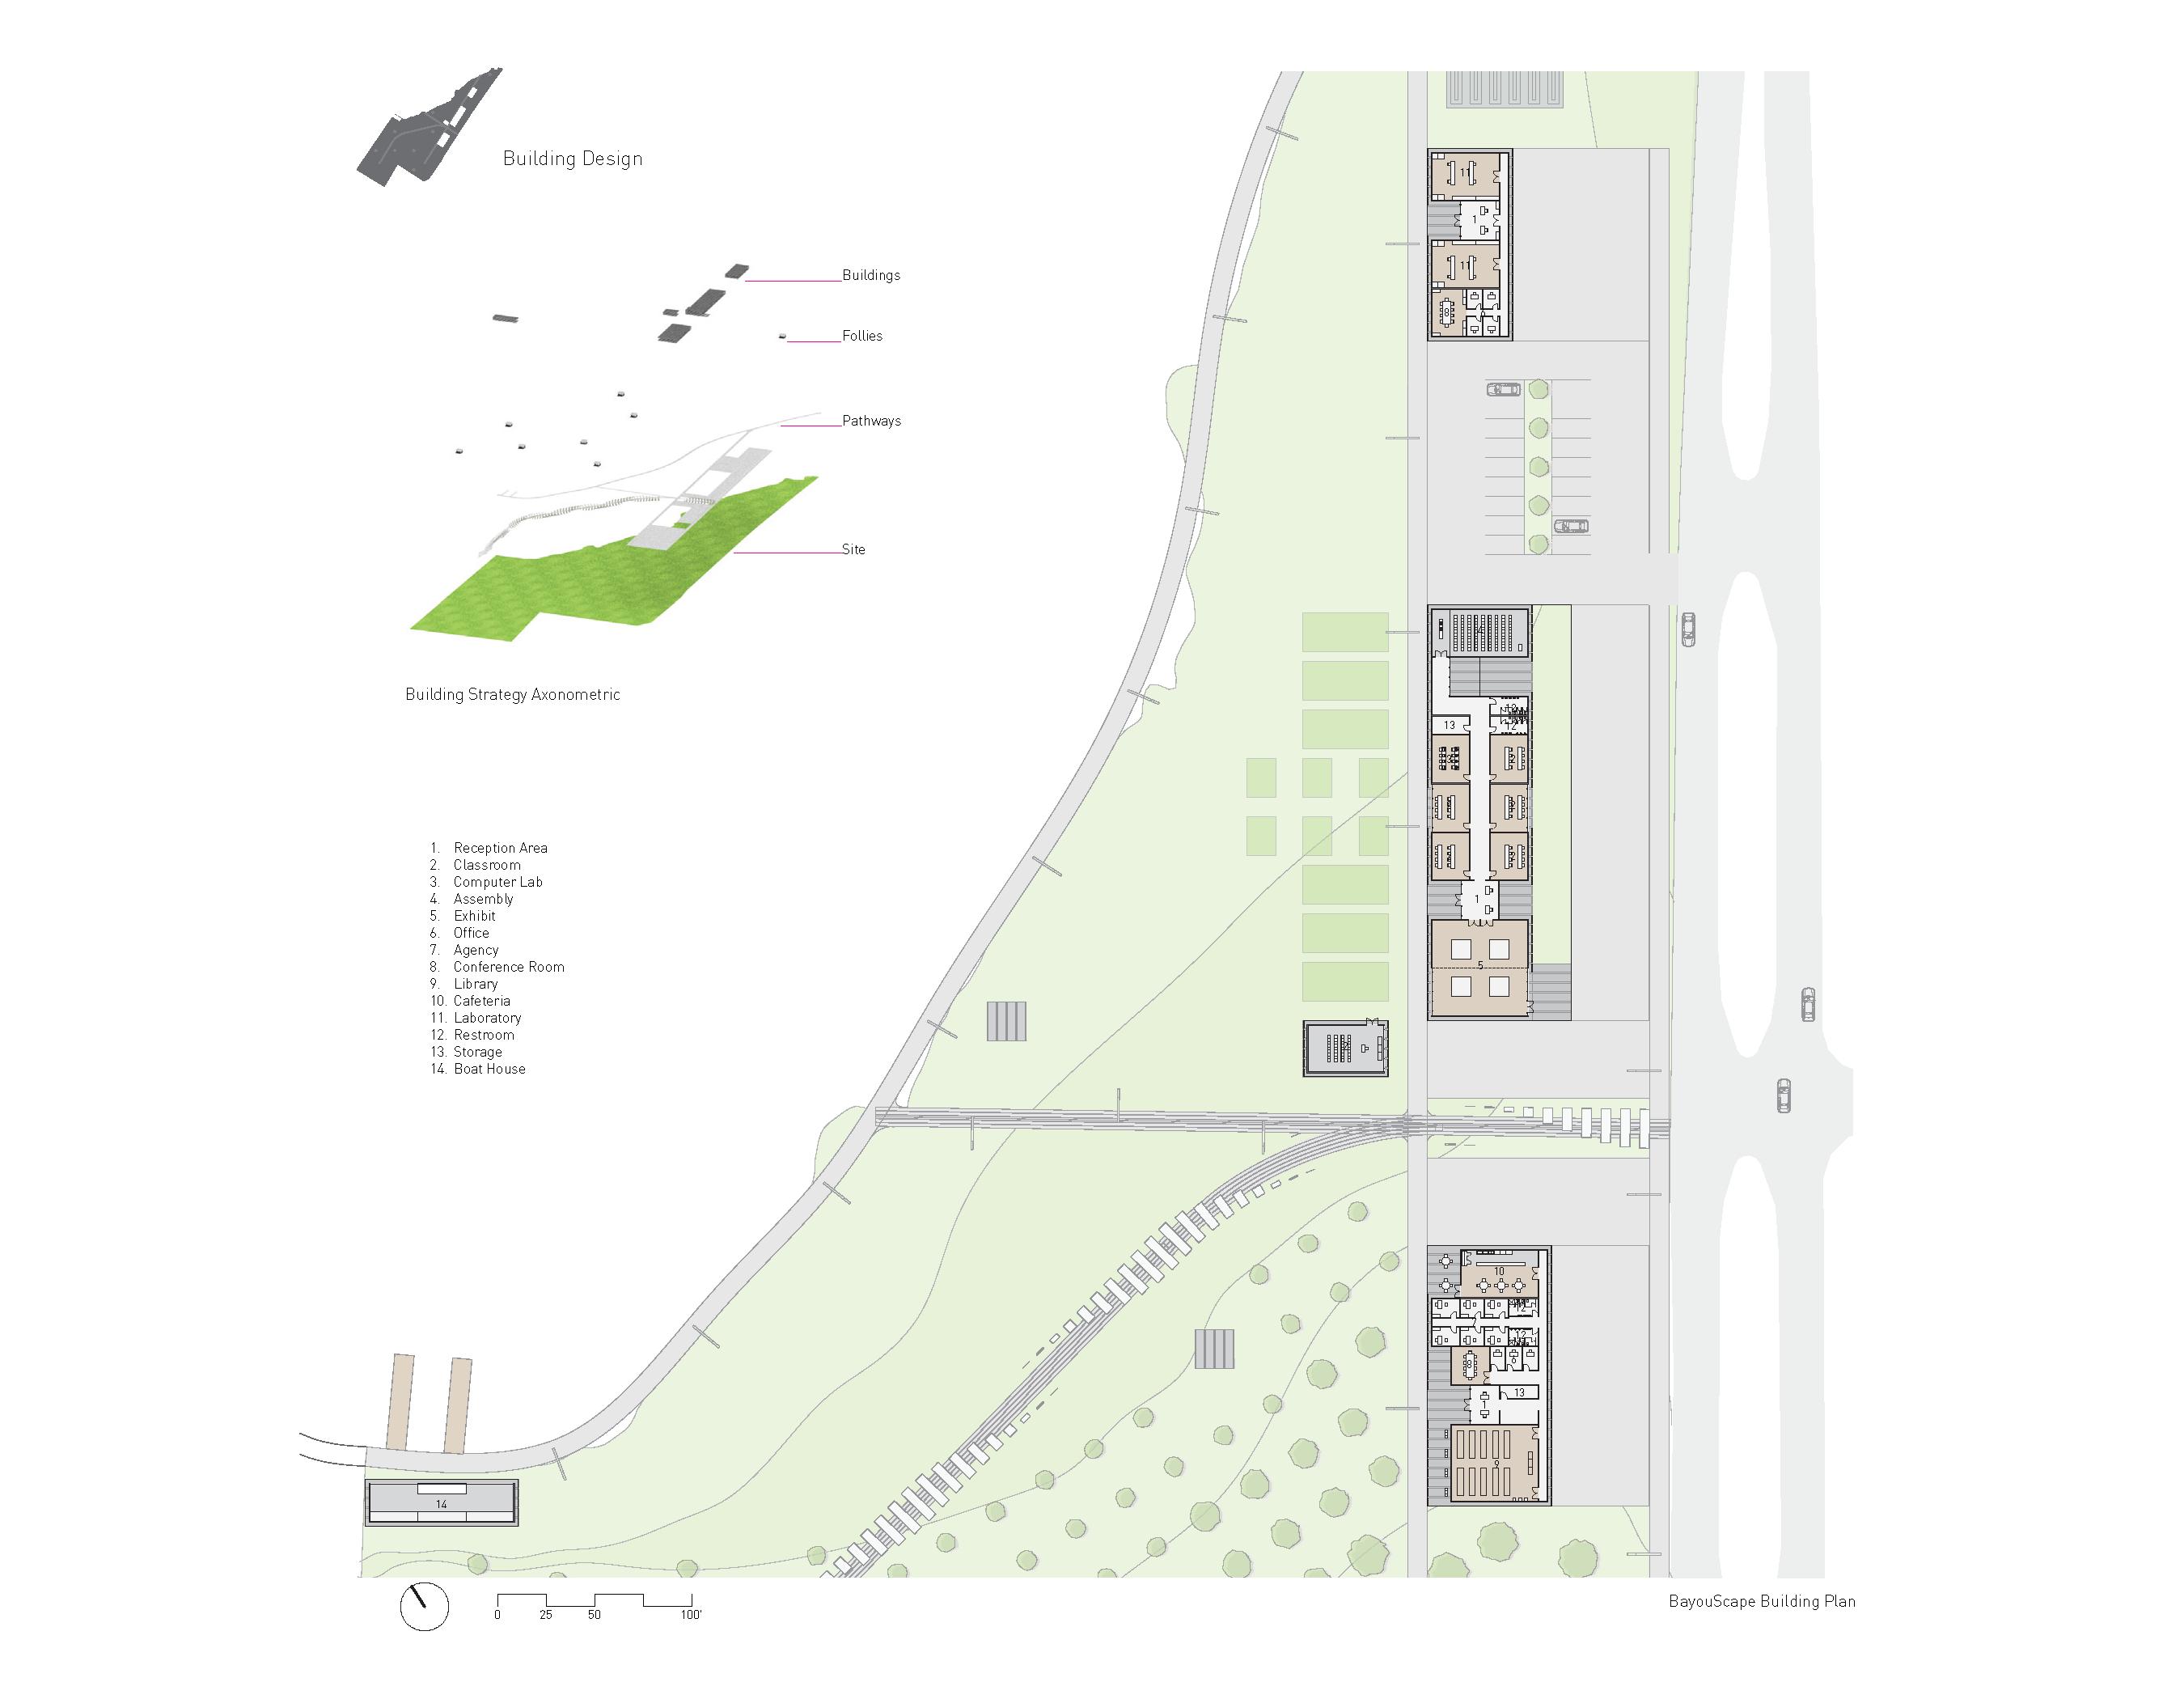 bayouscape enlarged plan